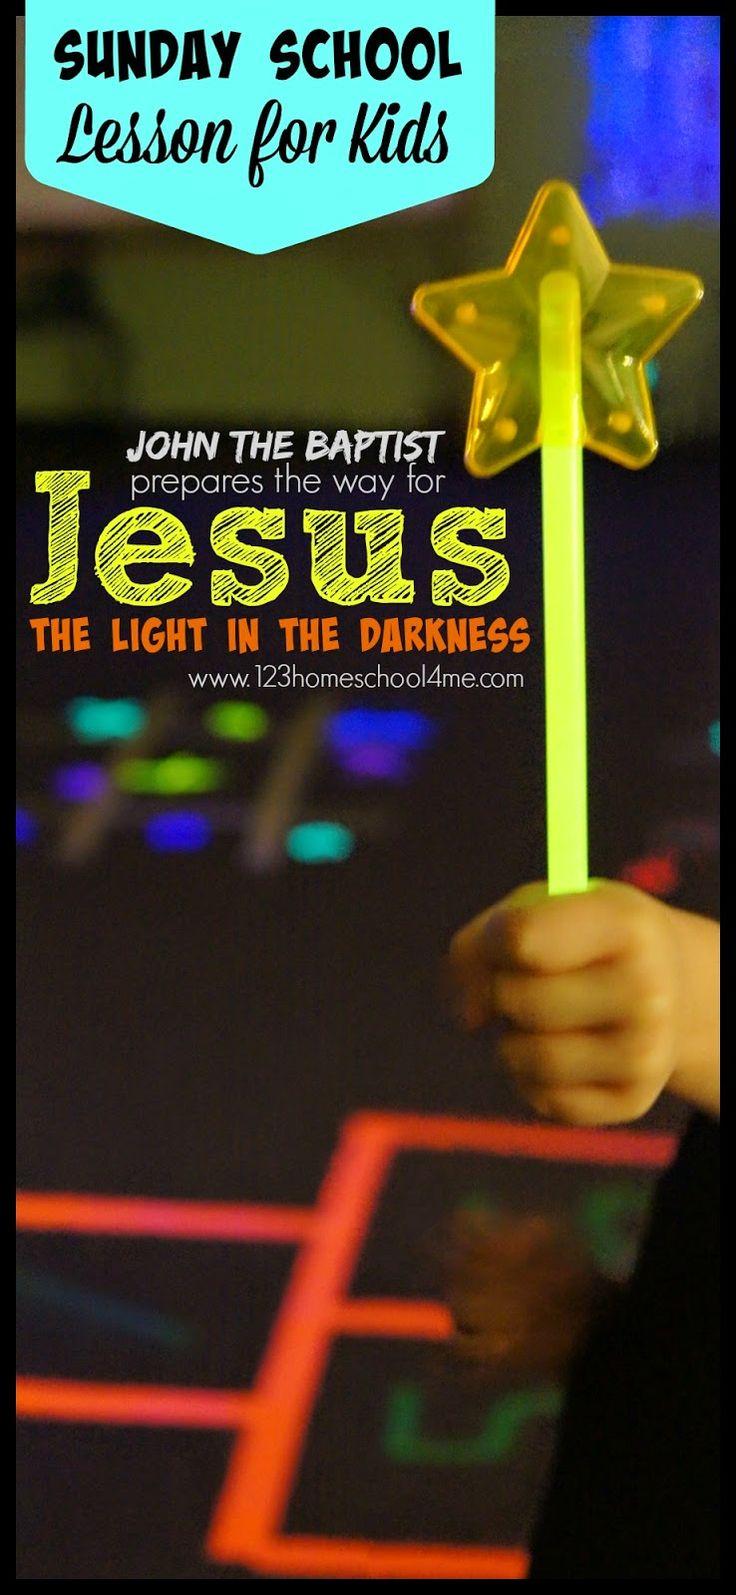 Baptist Bible Study - allaboutbaptists.com